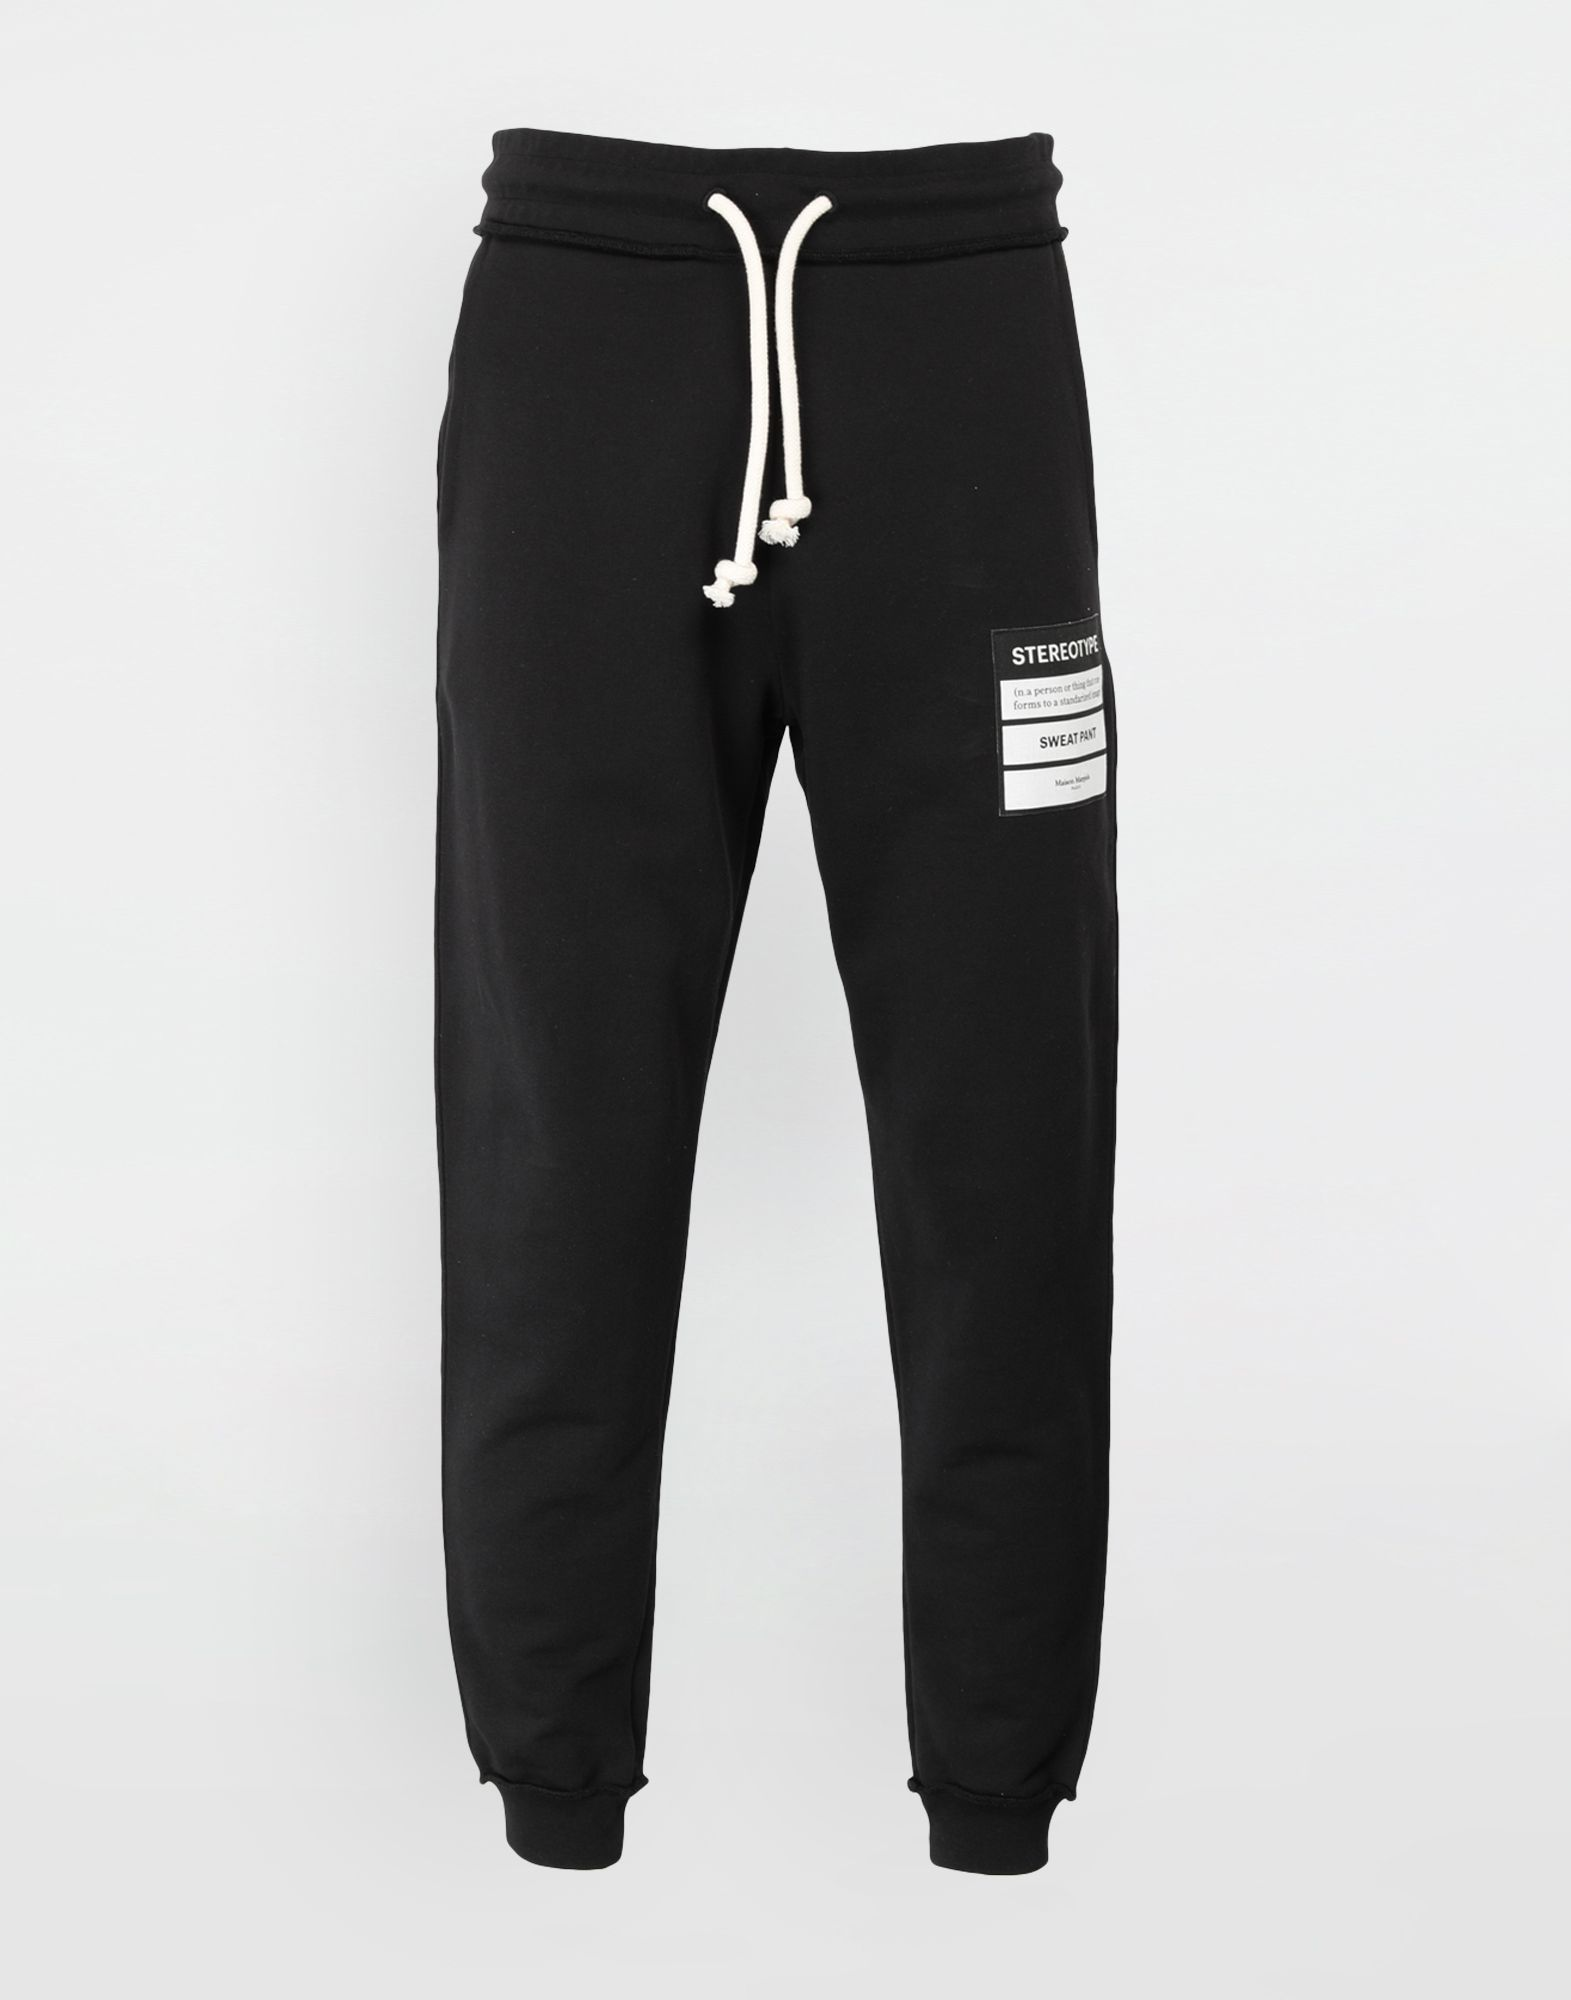 MAISON MARGIELA Stereotype jogging pants Casual pants Man f